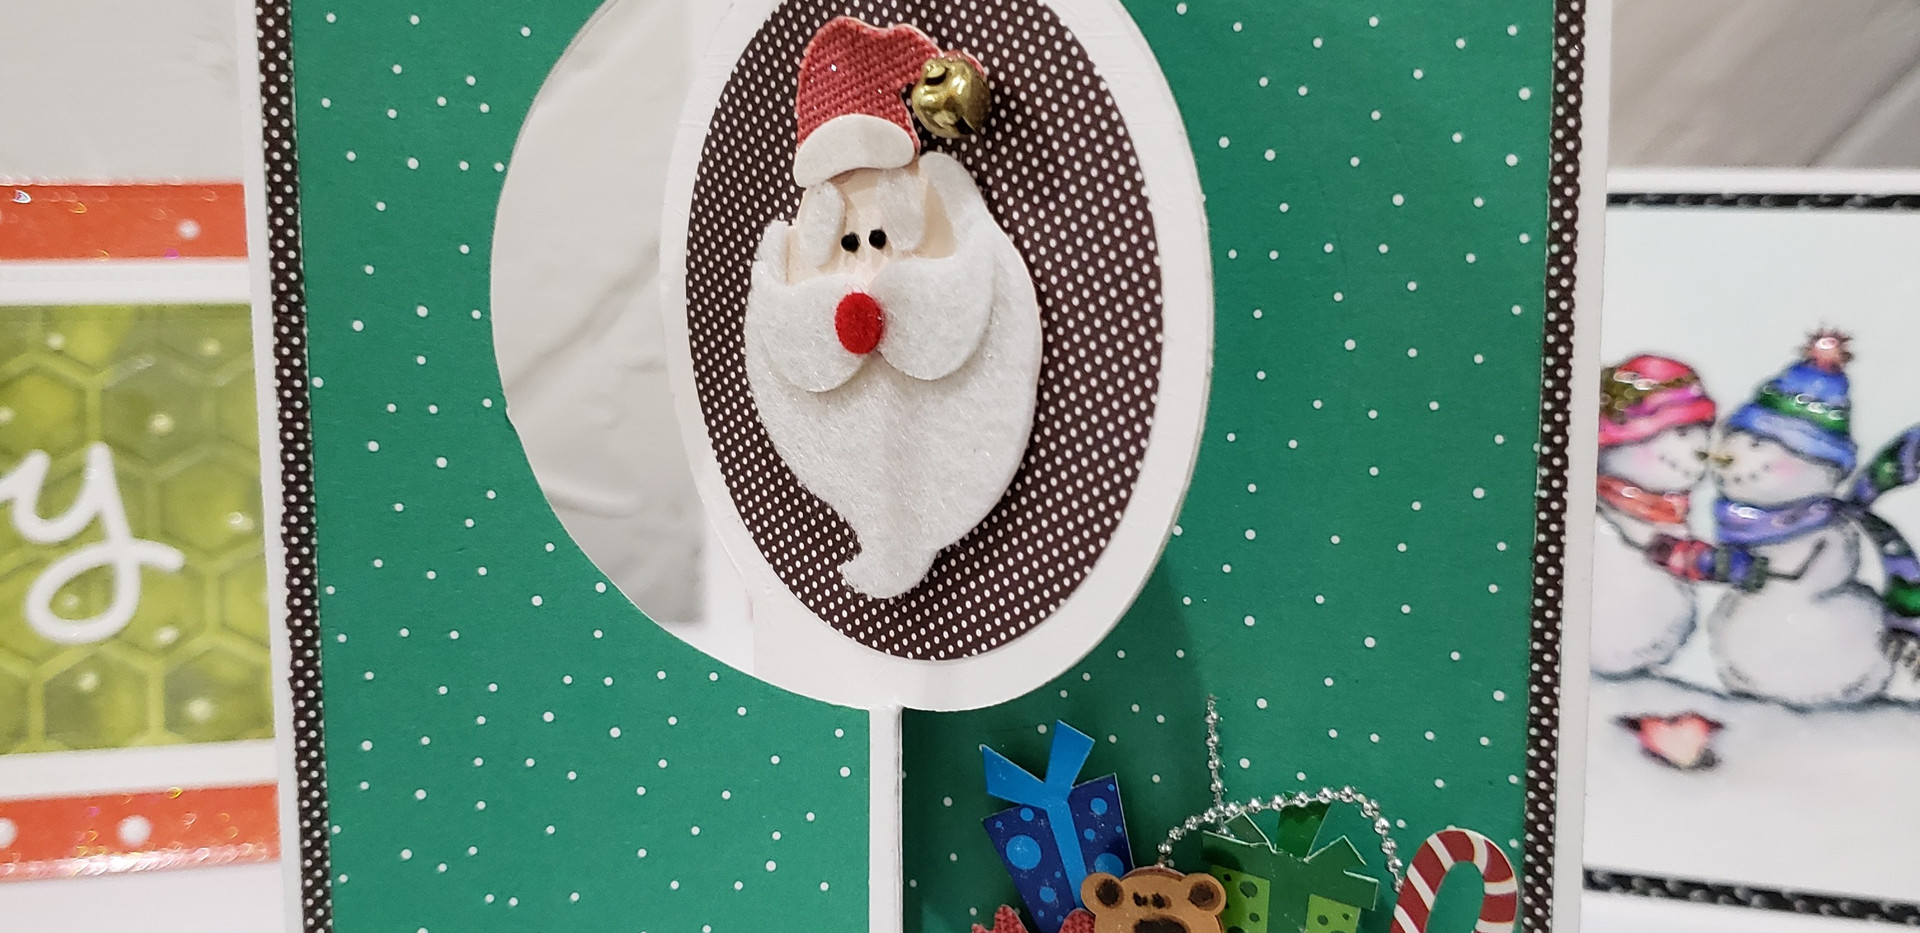 Card Christmas Joy - P Keating.jpg